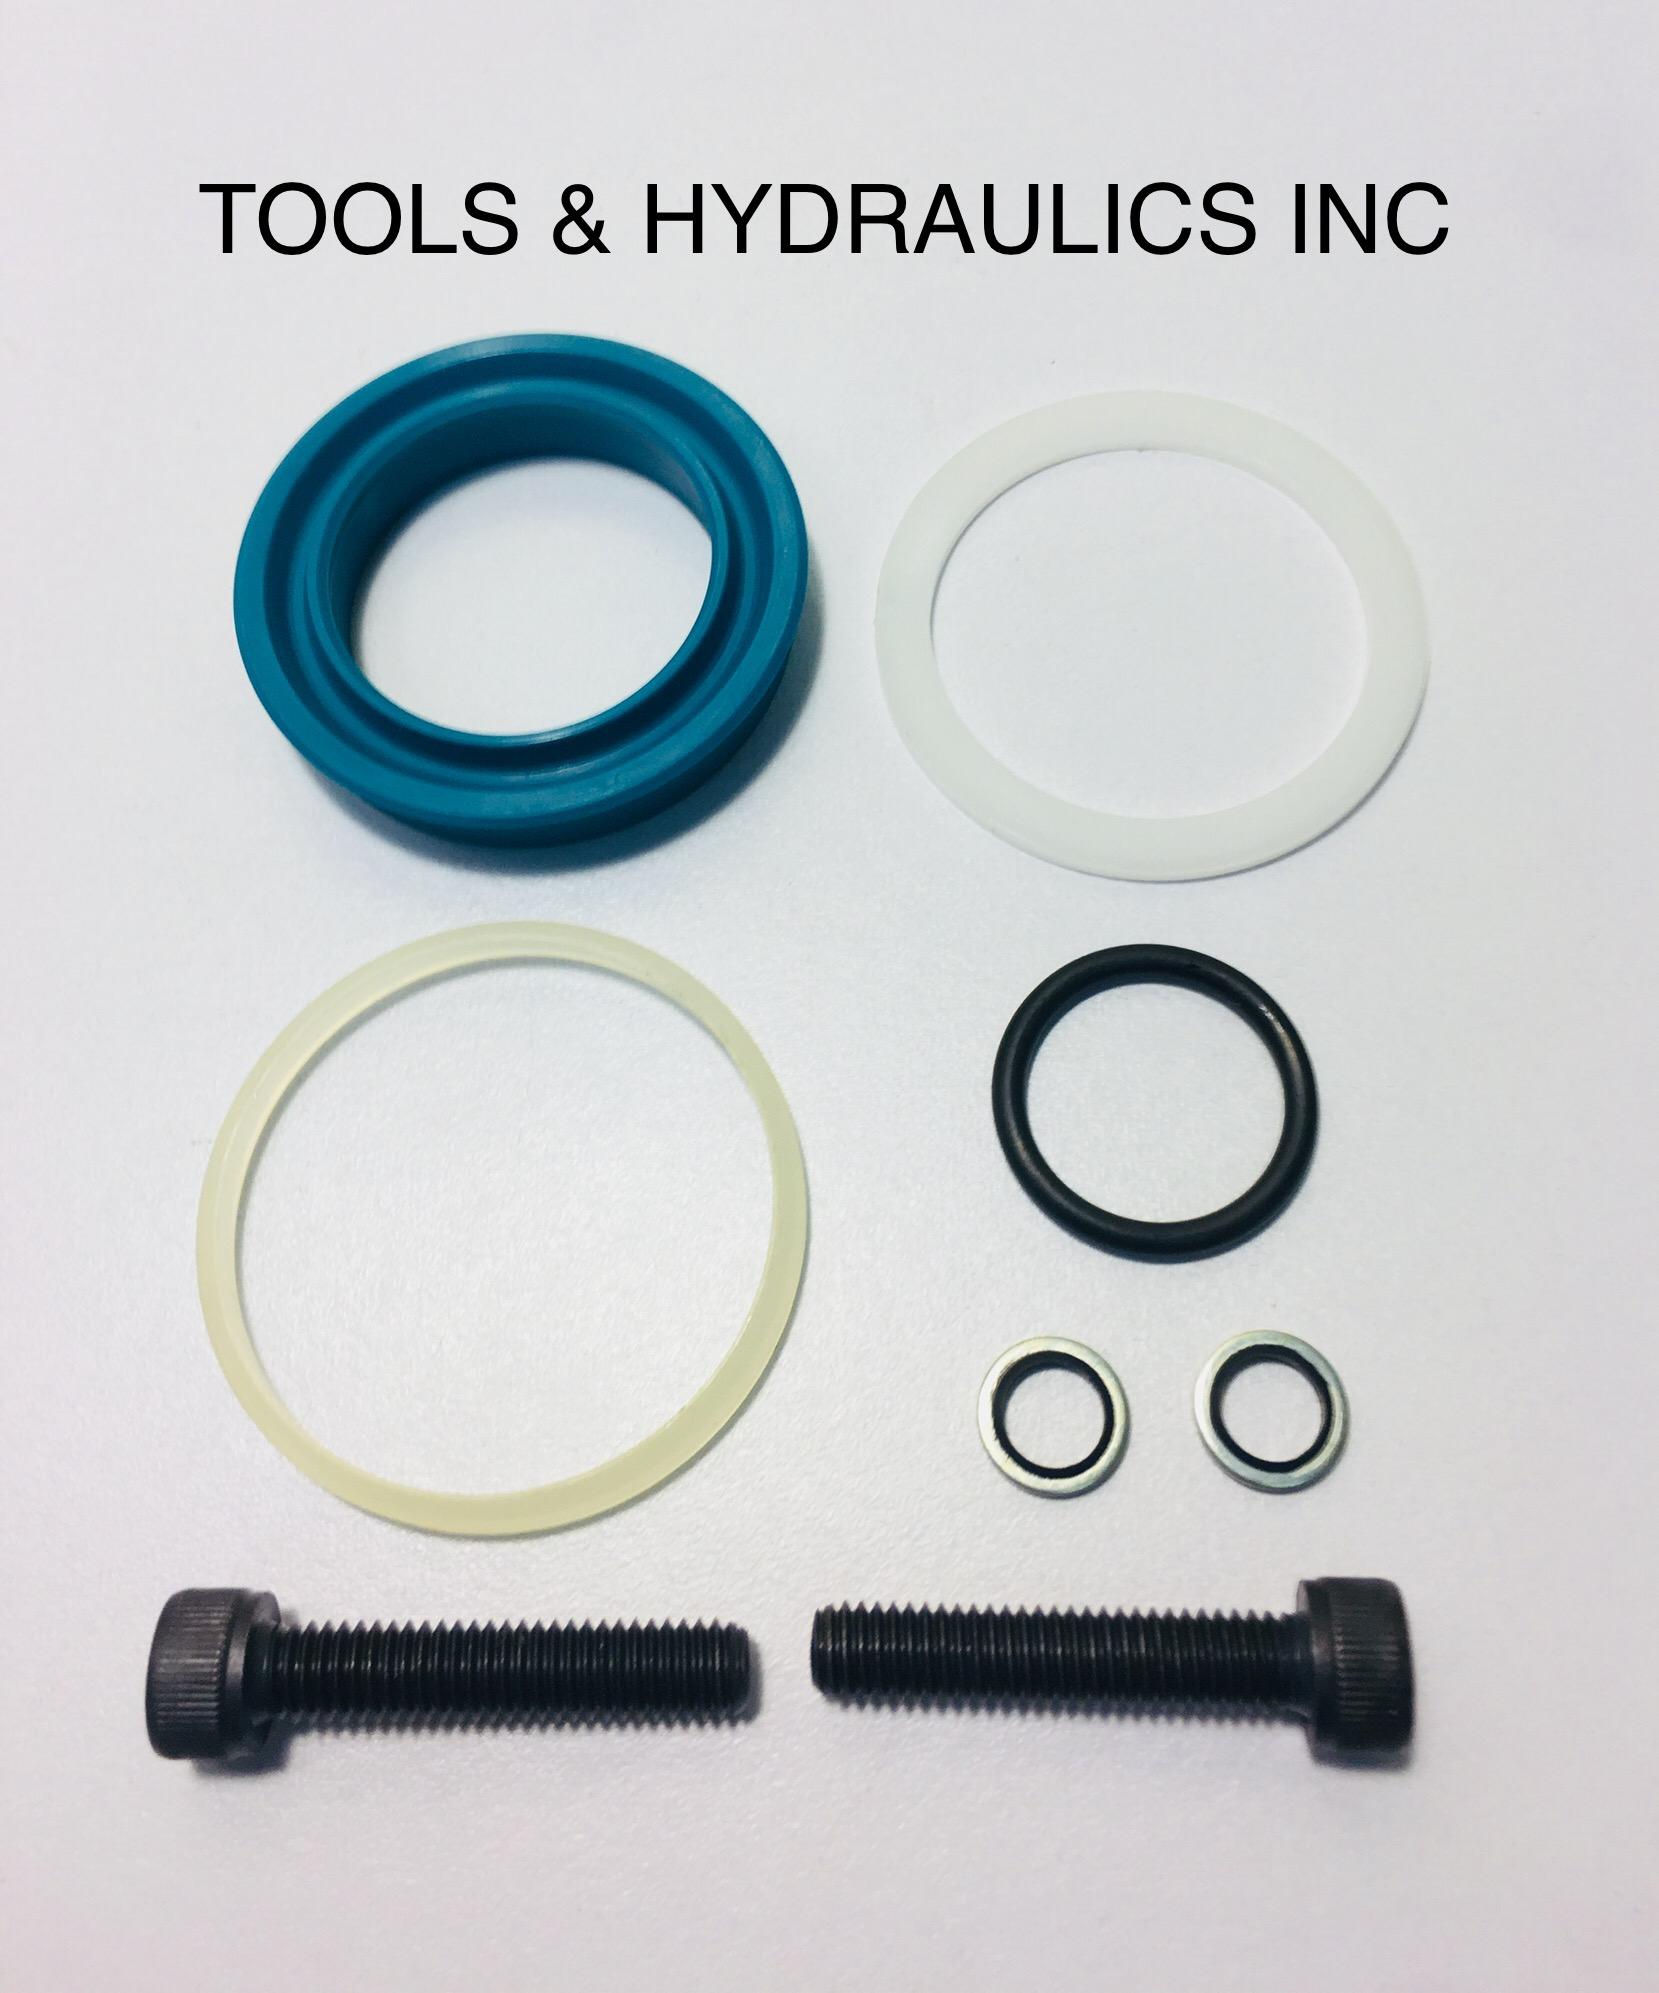 H10-3-9902-105